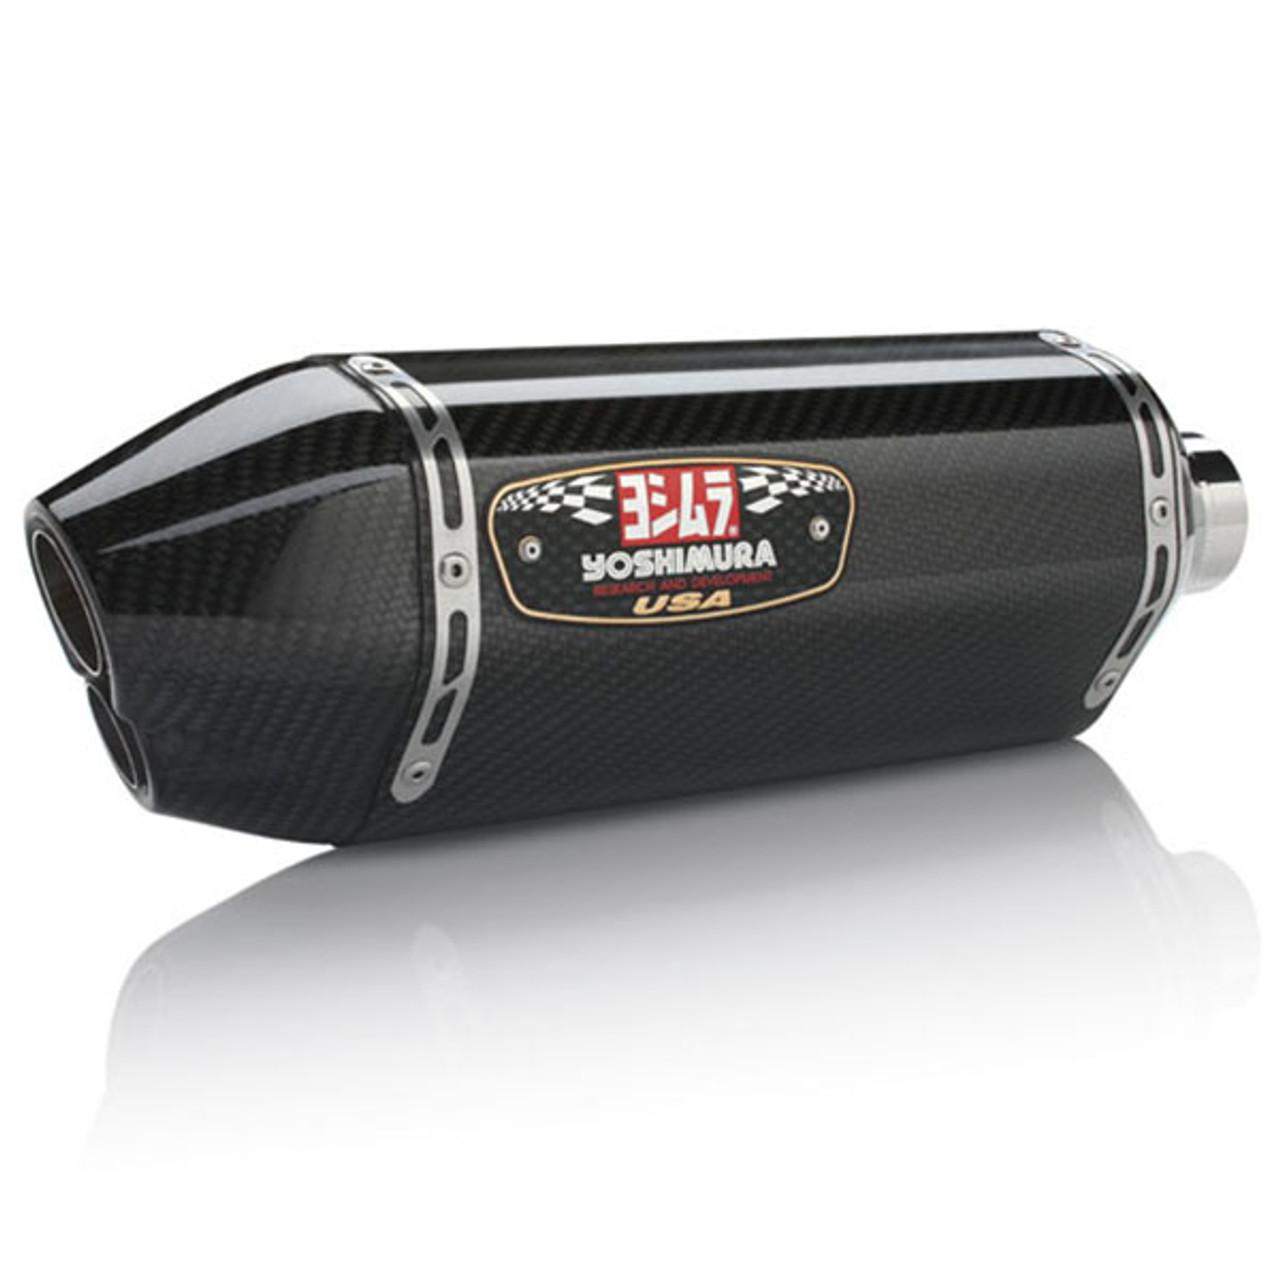 Yoshimura Honda Cb1000r 10 16 Race R 77 D 3 4 Exhaust System Sportbike Track Gear